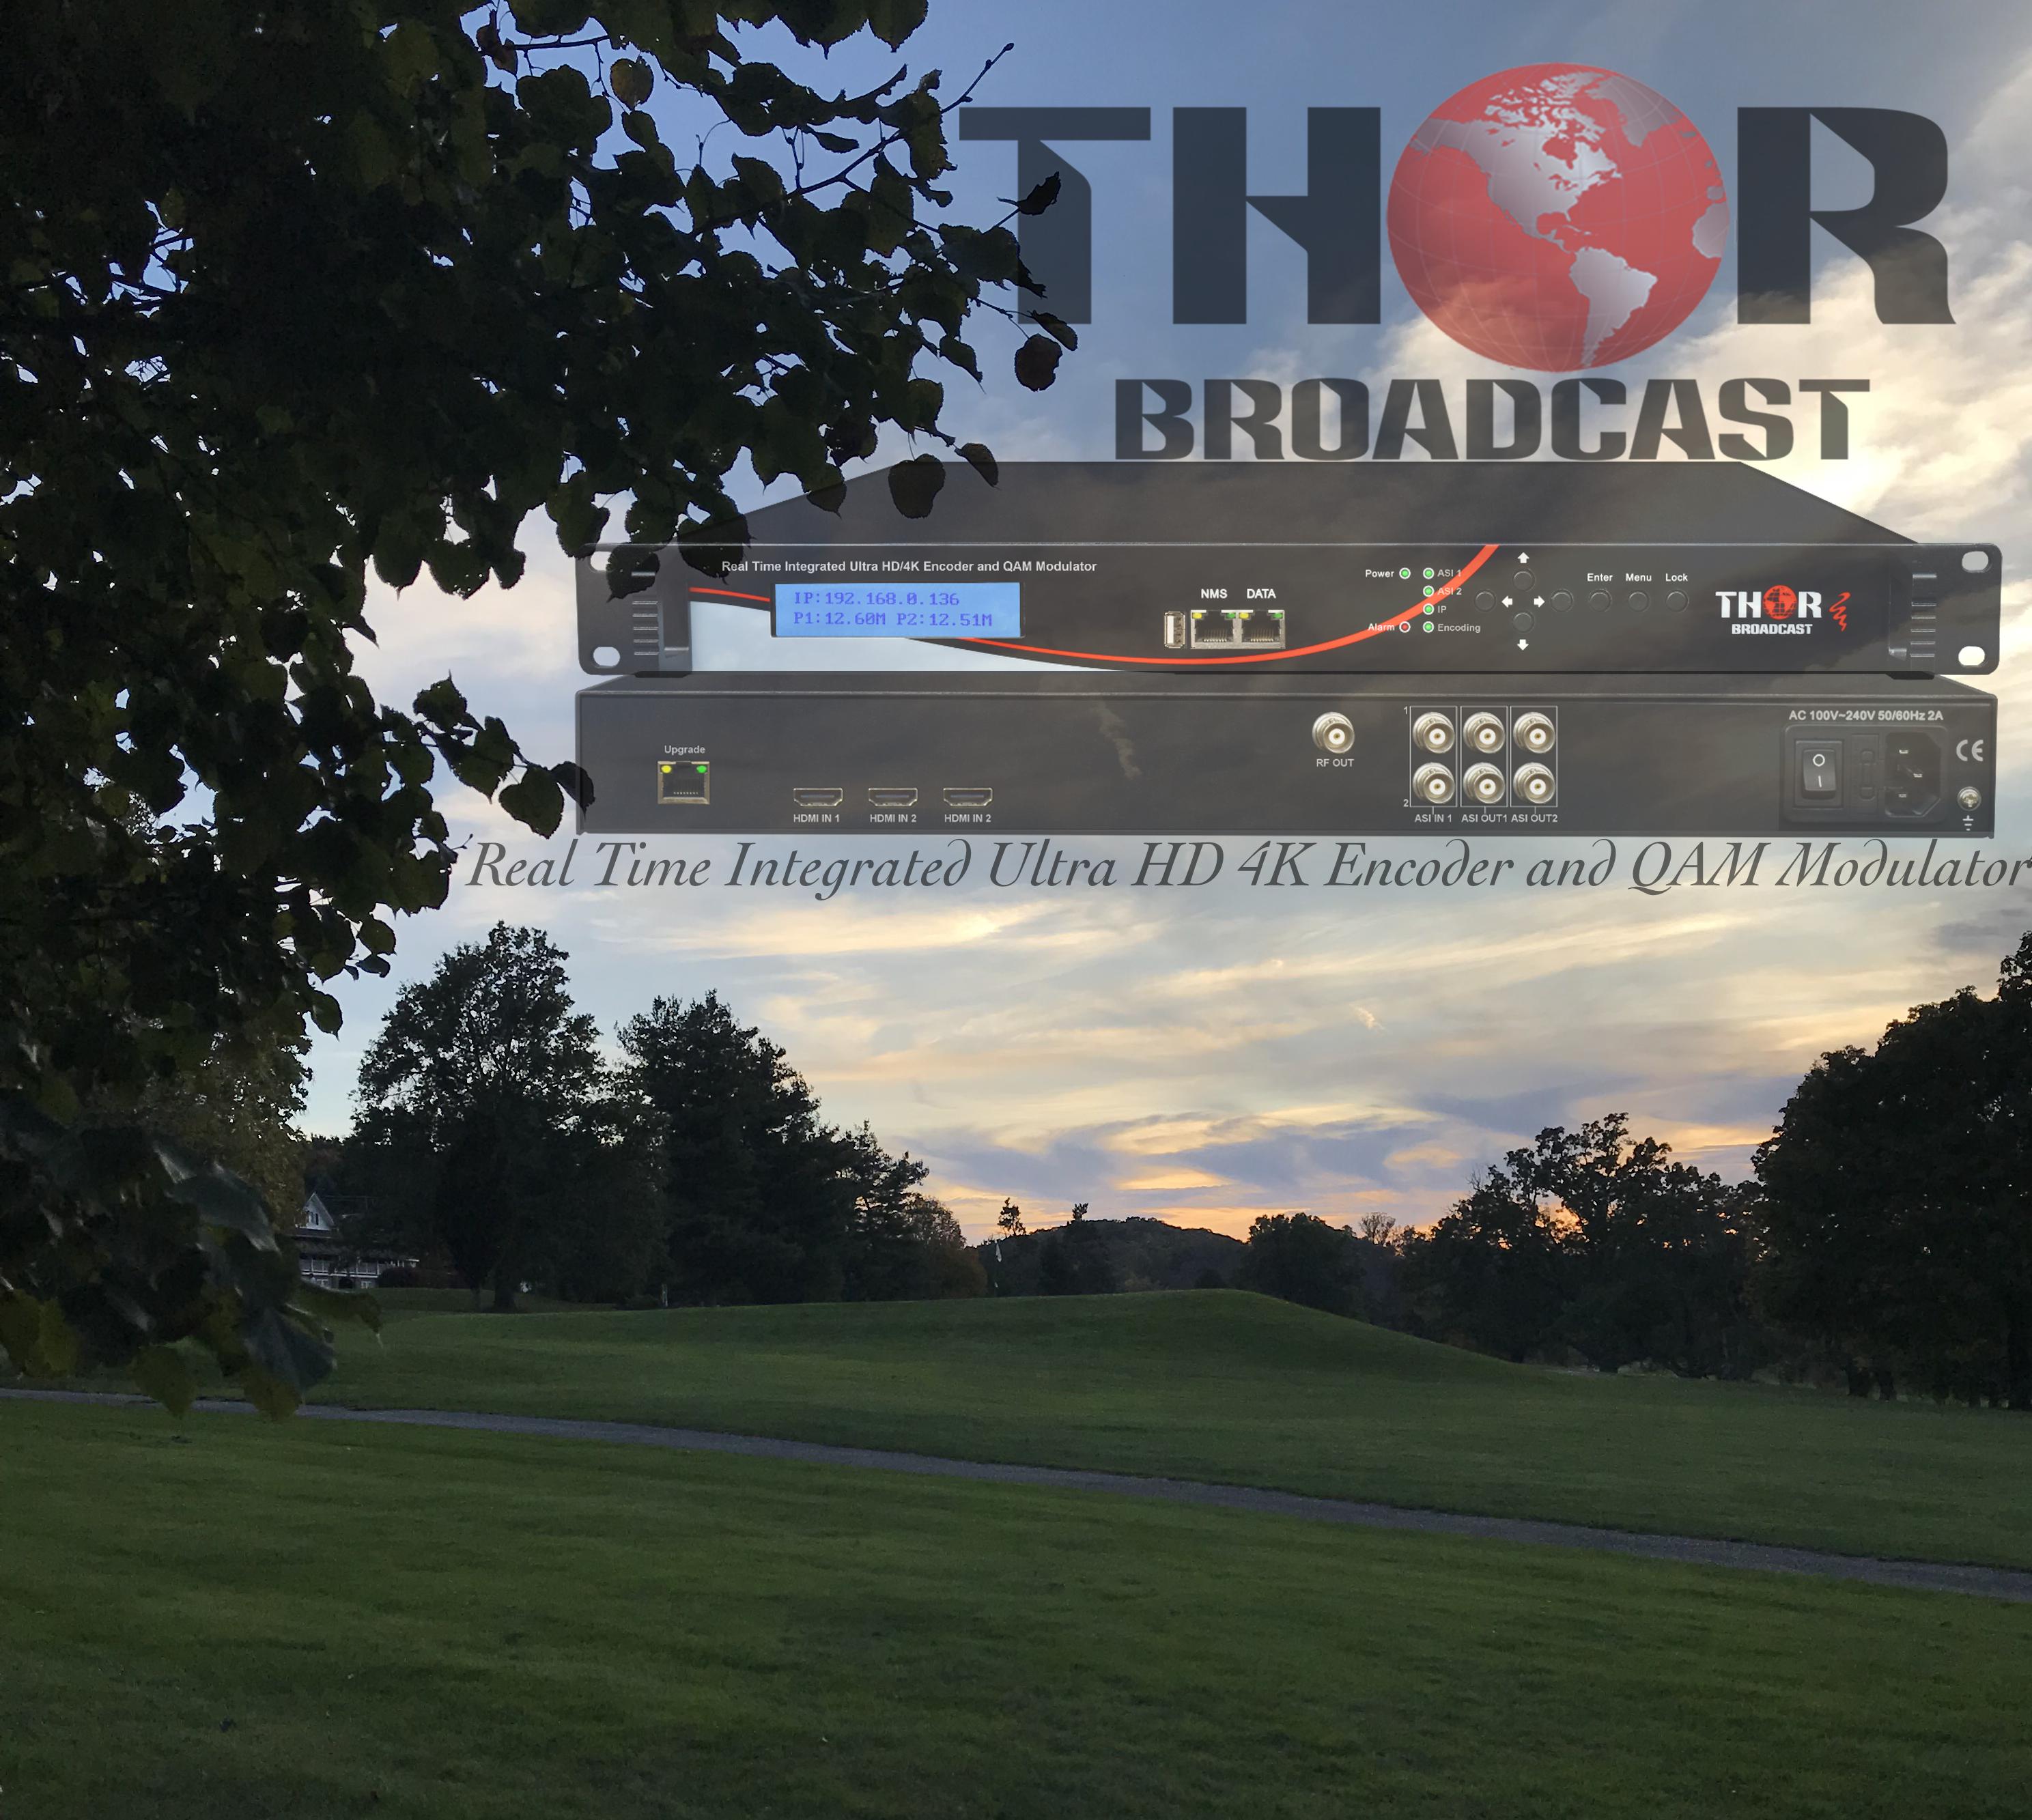 Pin On Thor Broadcast Thor Fiber Equipment Tech